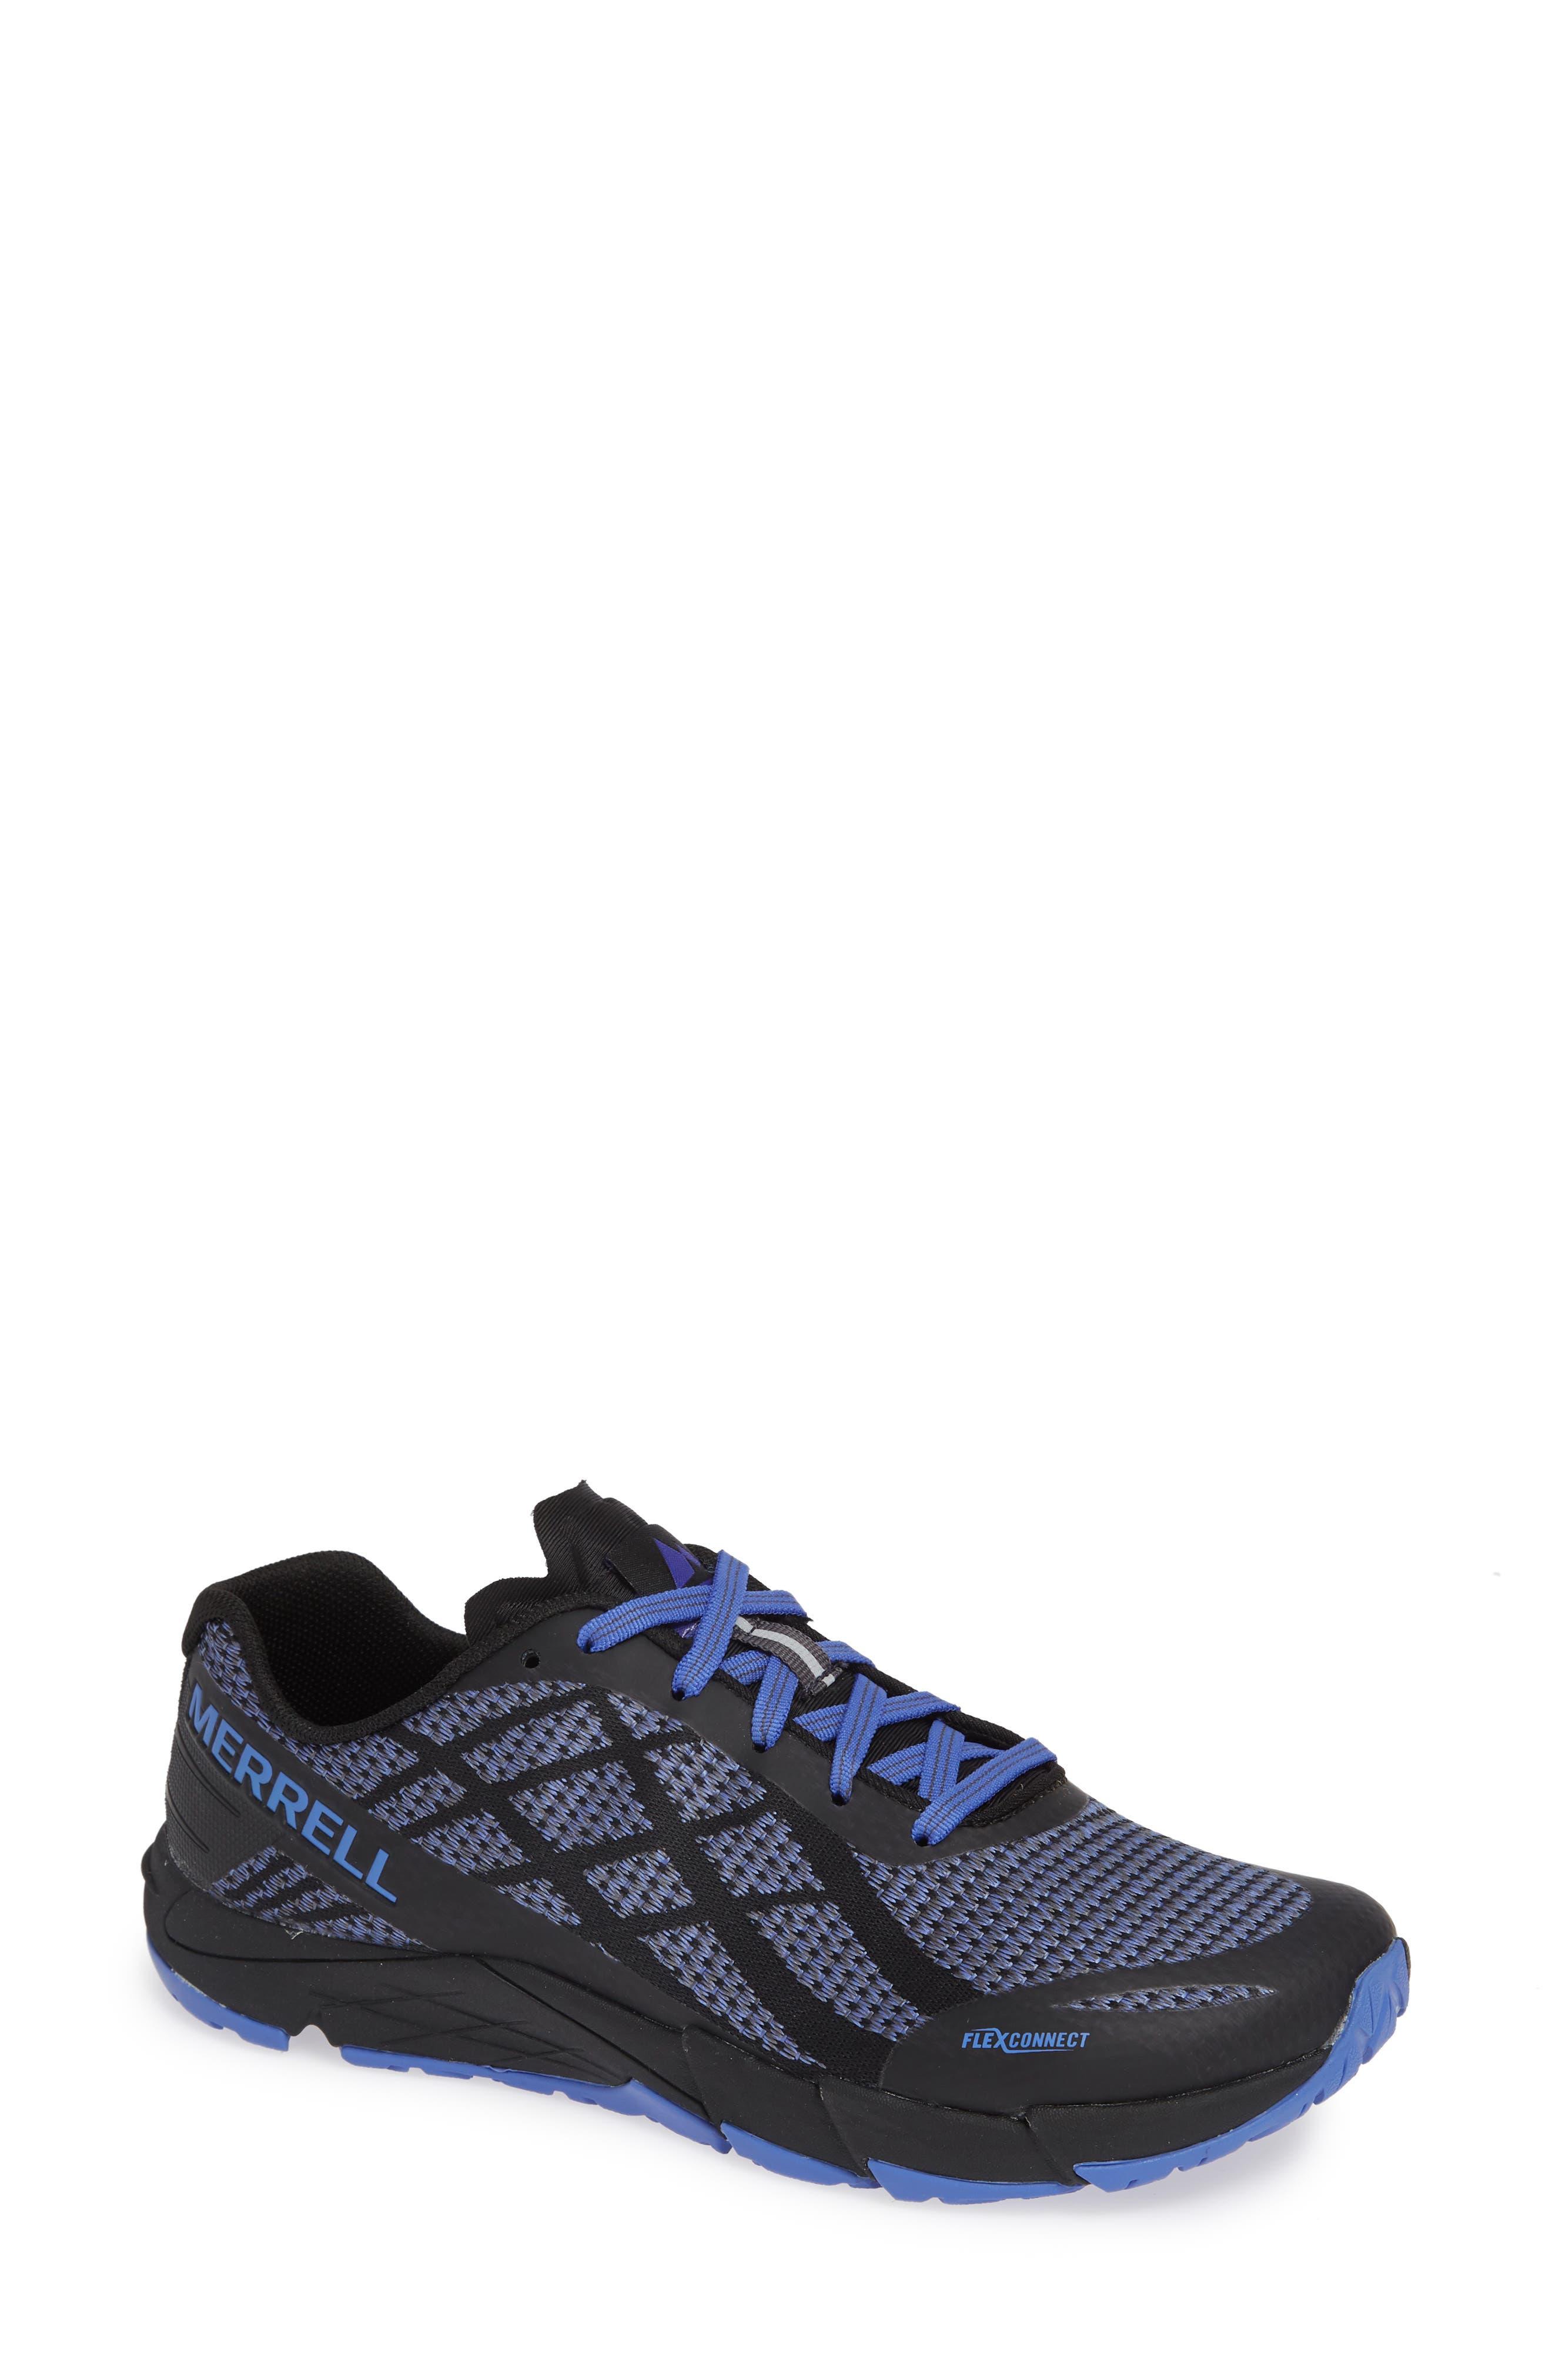 MERRELL, Bare Access Flex Shield Lace-Up Sneaker, Main thumbnail 1, color, 001